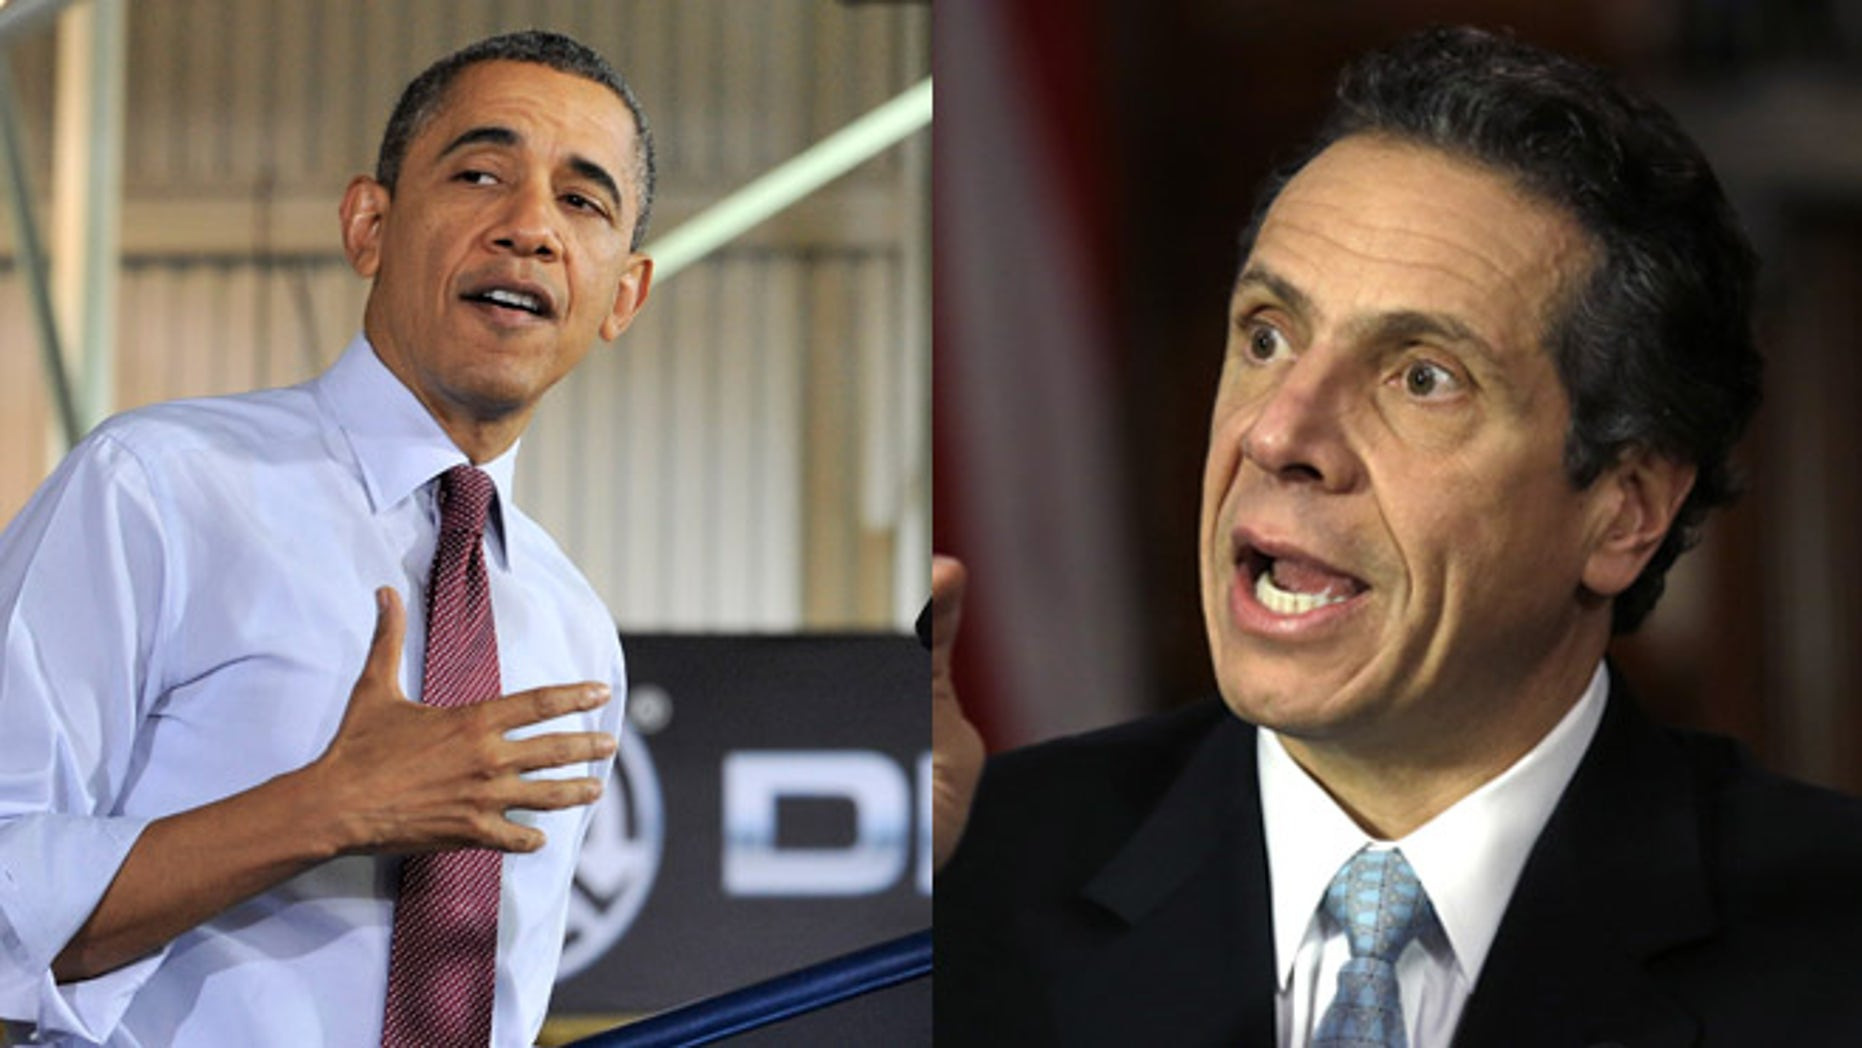 Shown here are President Obama and New York Gov. Andrew Cuomo.